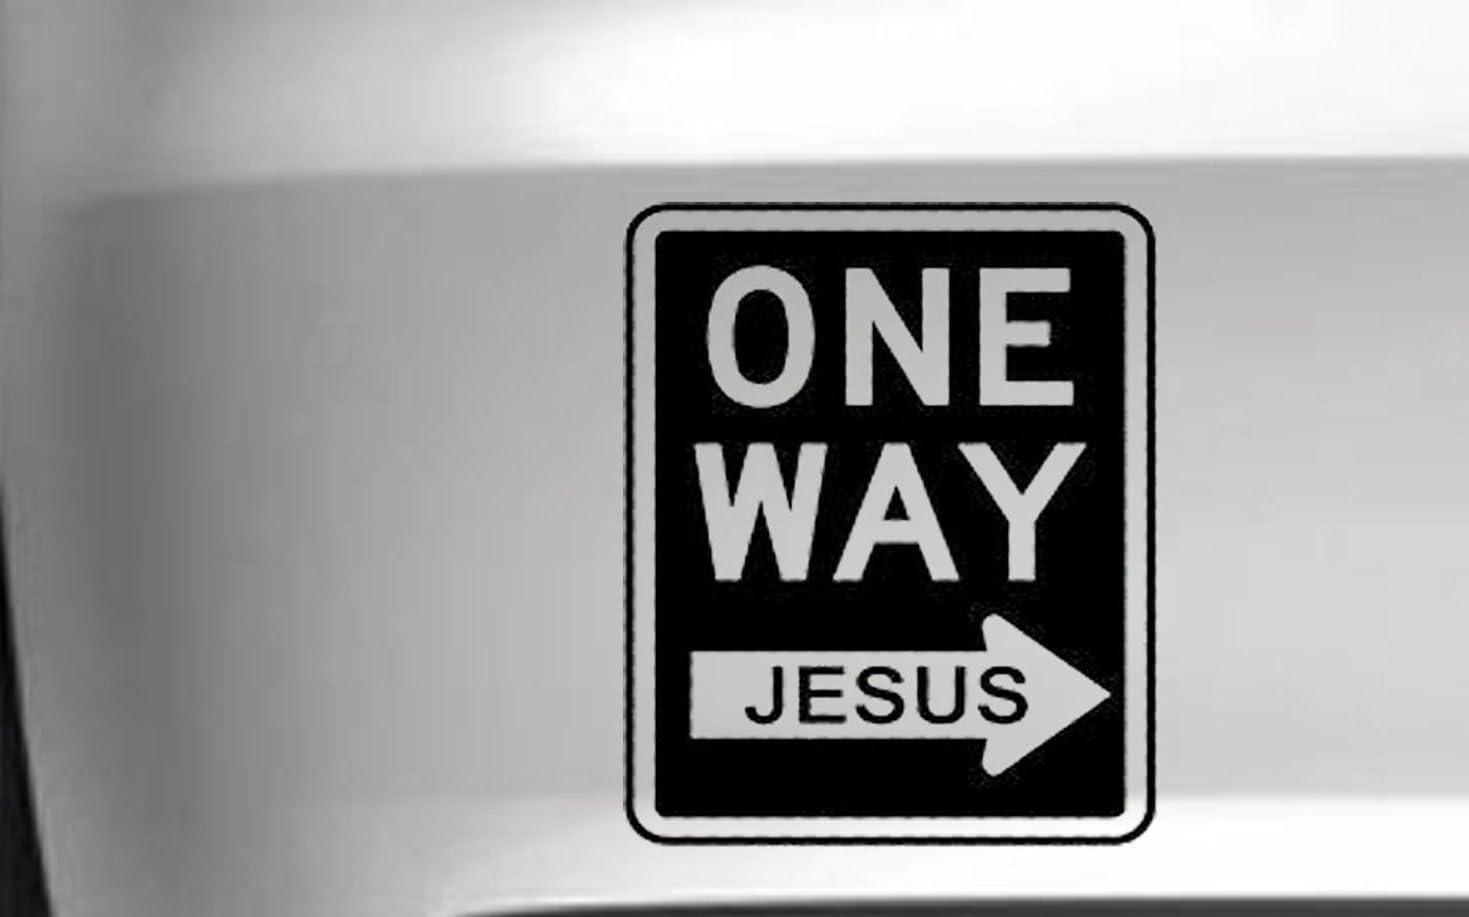 One Way Jesus車ビニールデカールビニールデカールJDM 4 x 4 Funny , Die Cut Vinyl Decal for Windows車、トラック、ツールボックス、ノートパソコン、ほぼすべてmacbook-ハード 12 Inch グレイ Titans-Unique-Design-120139-GRY-12-In